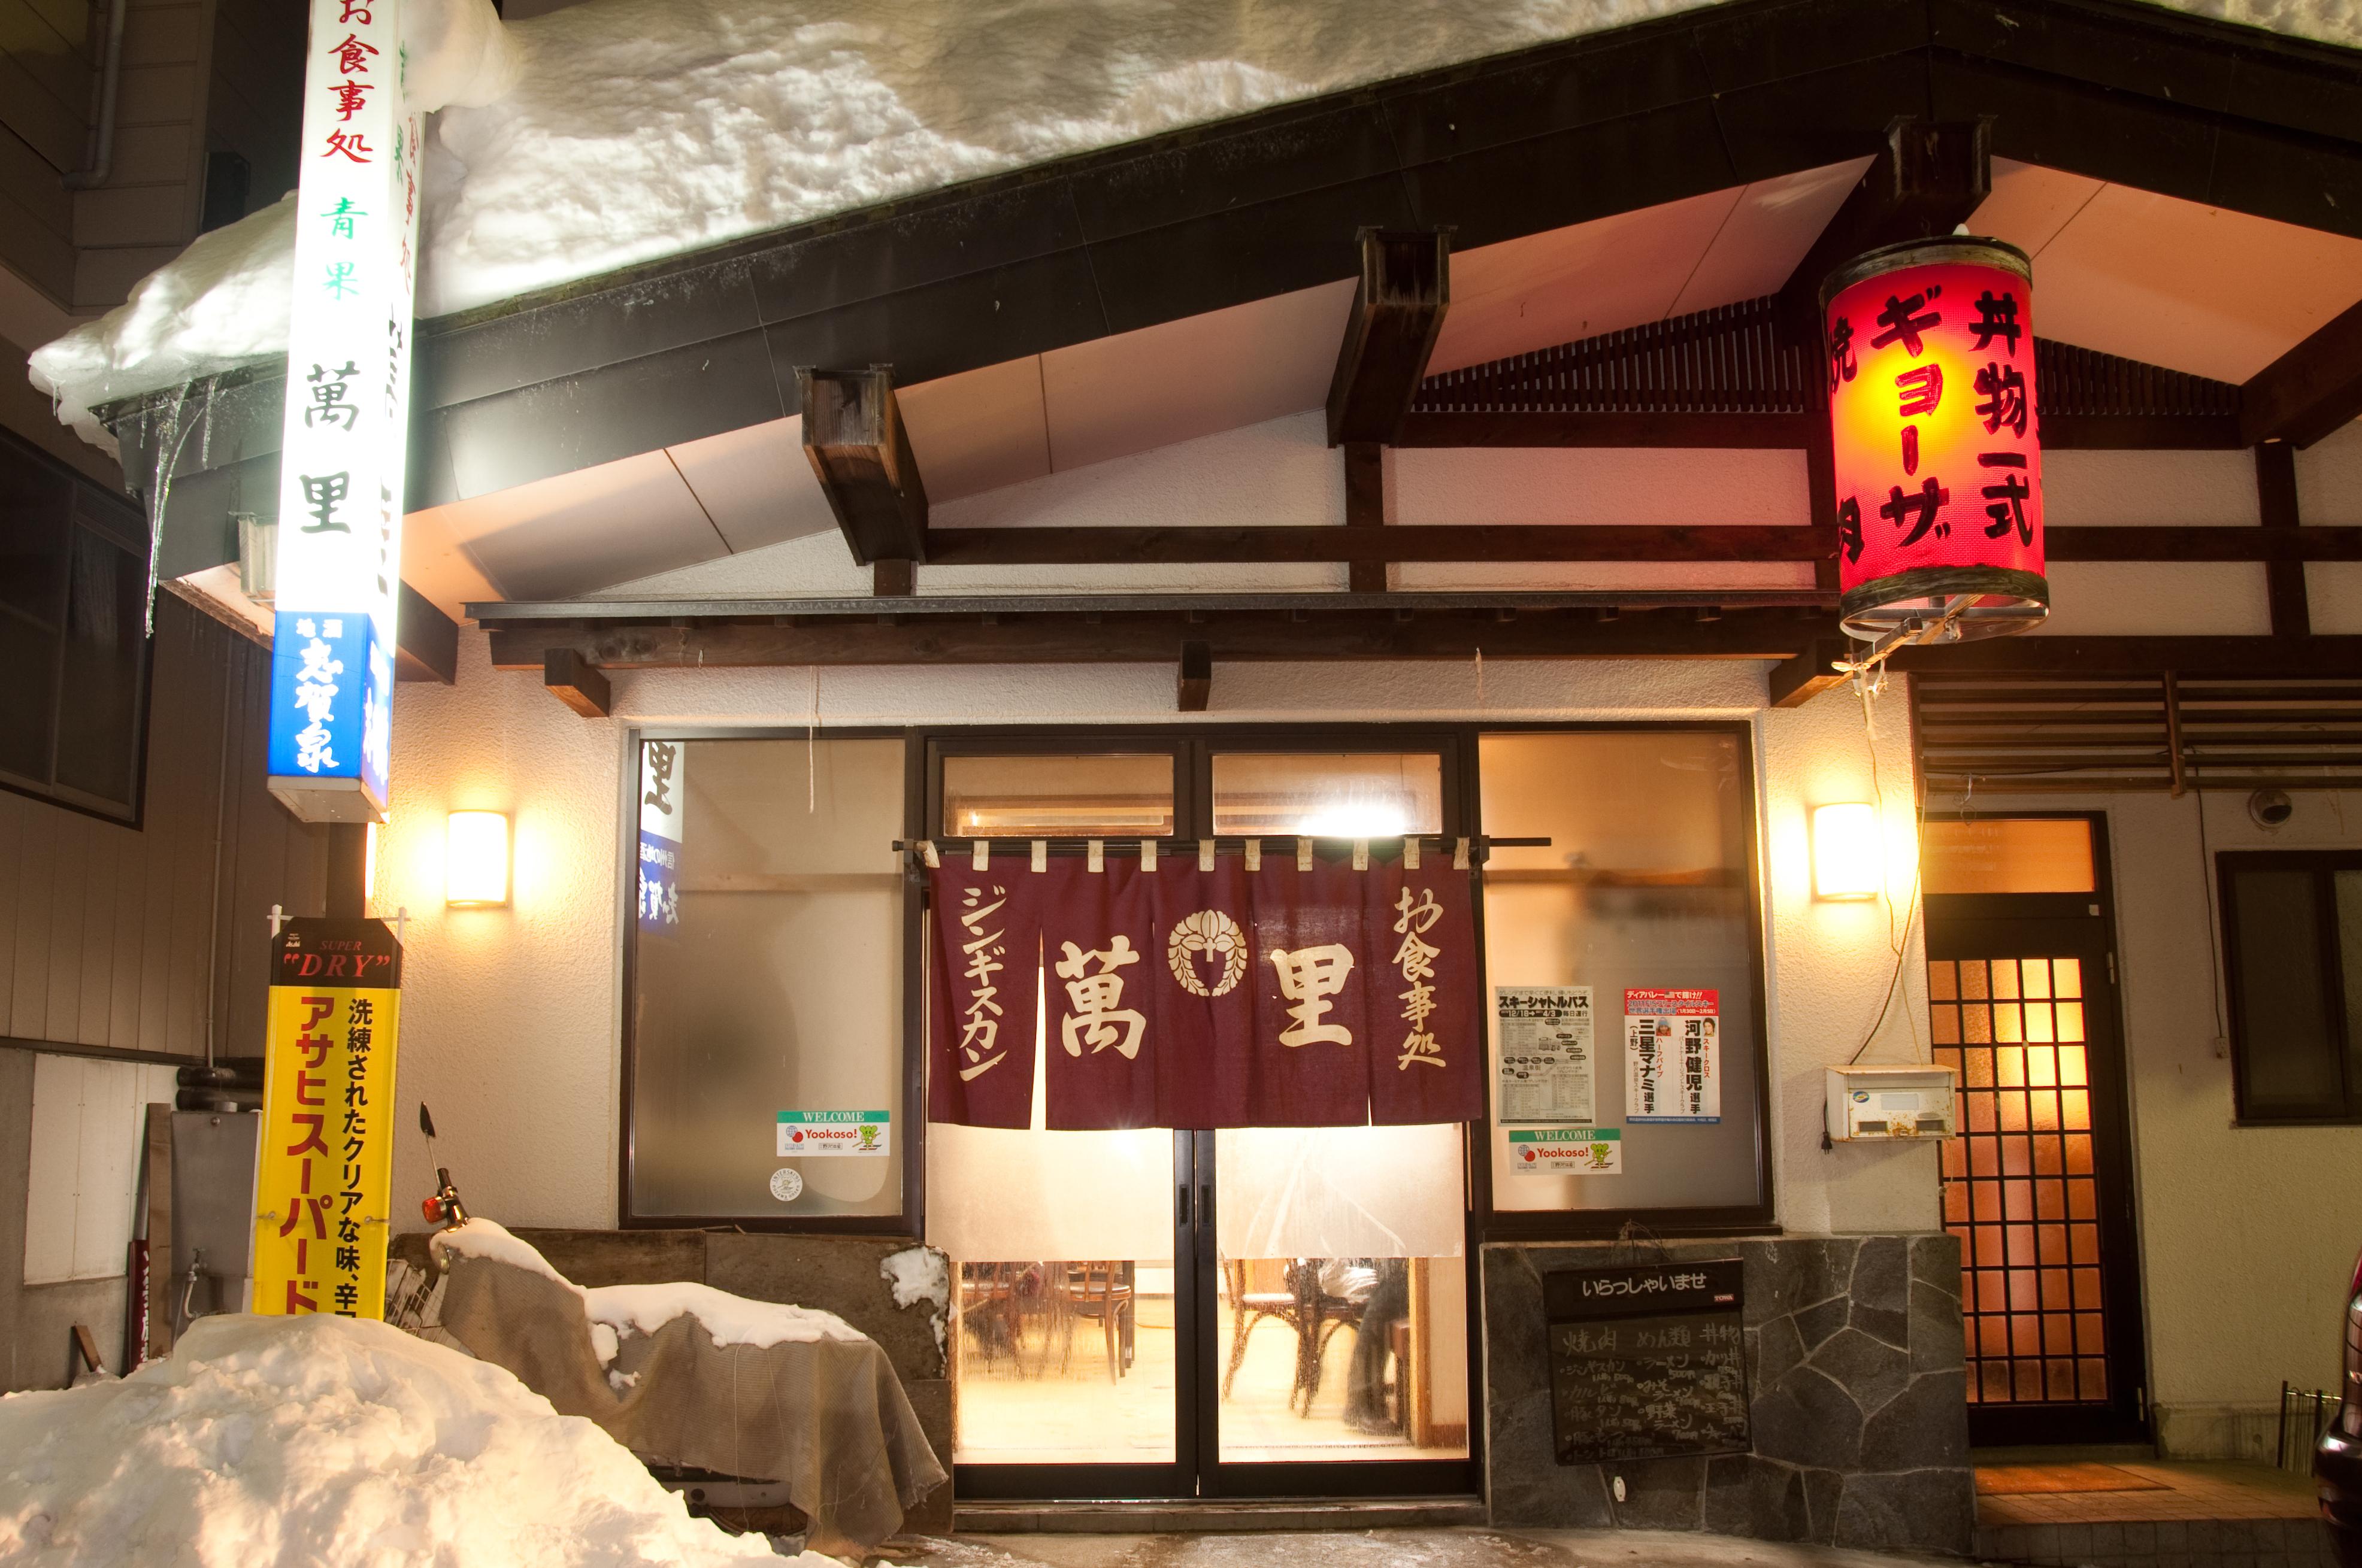 Banri Yaki Niku Restaurant Nozawa Onsen Japan - Simple style great food